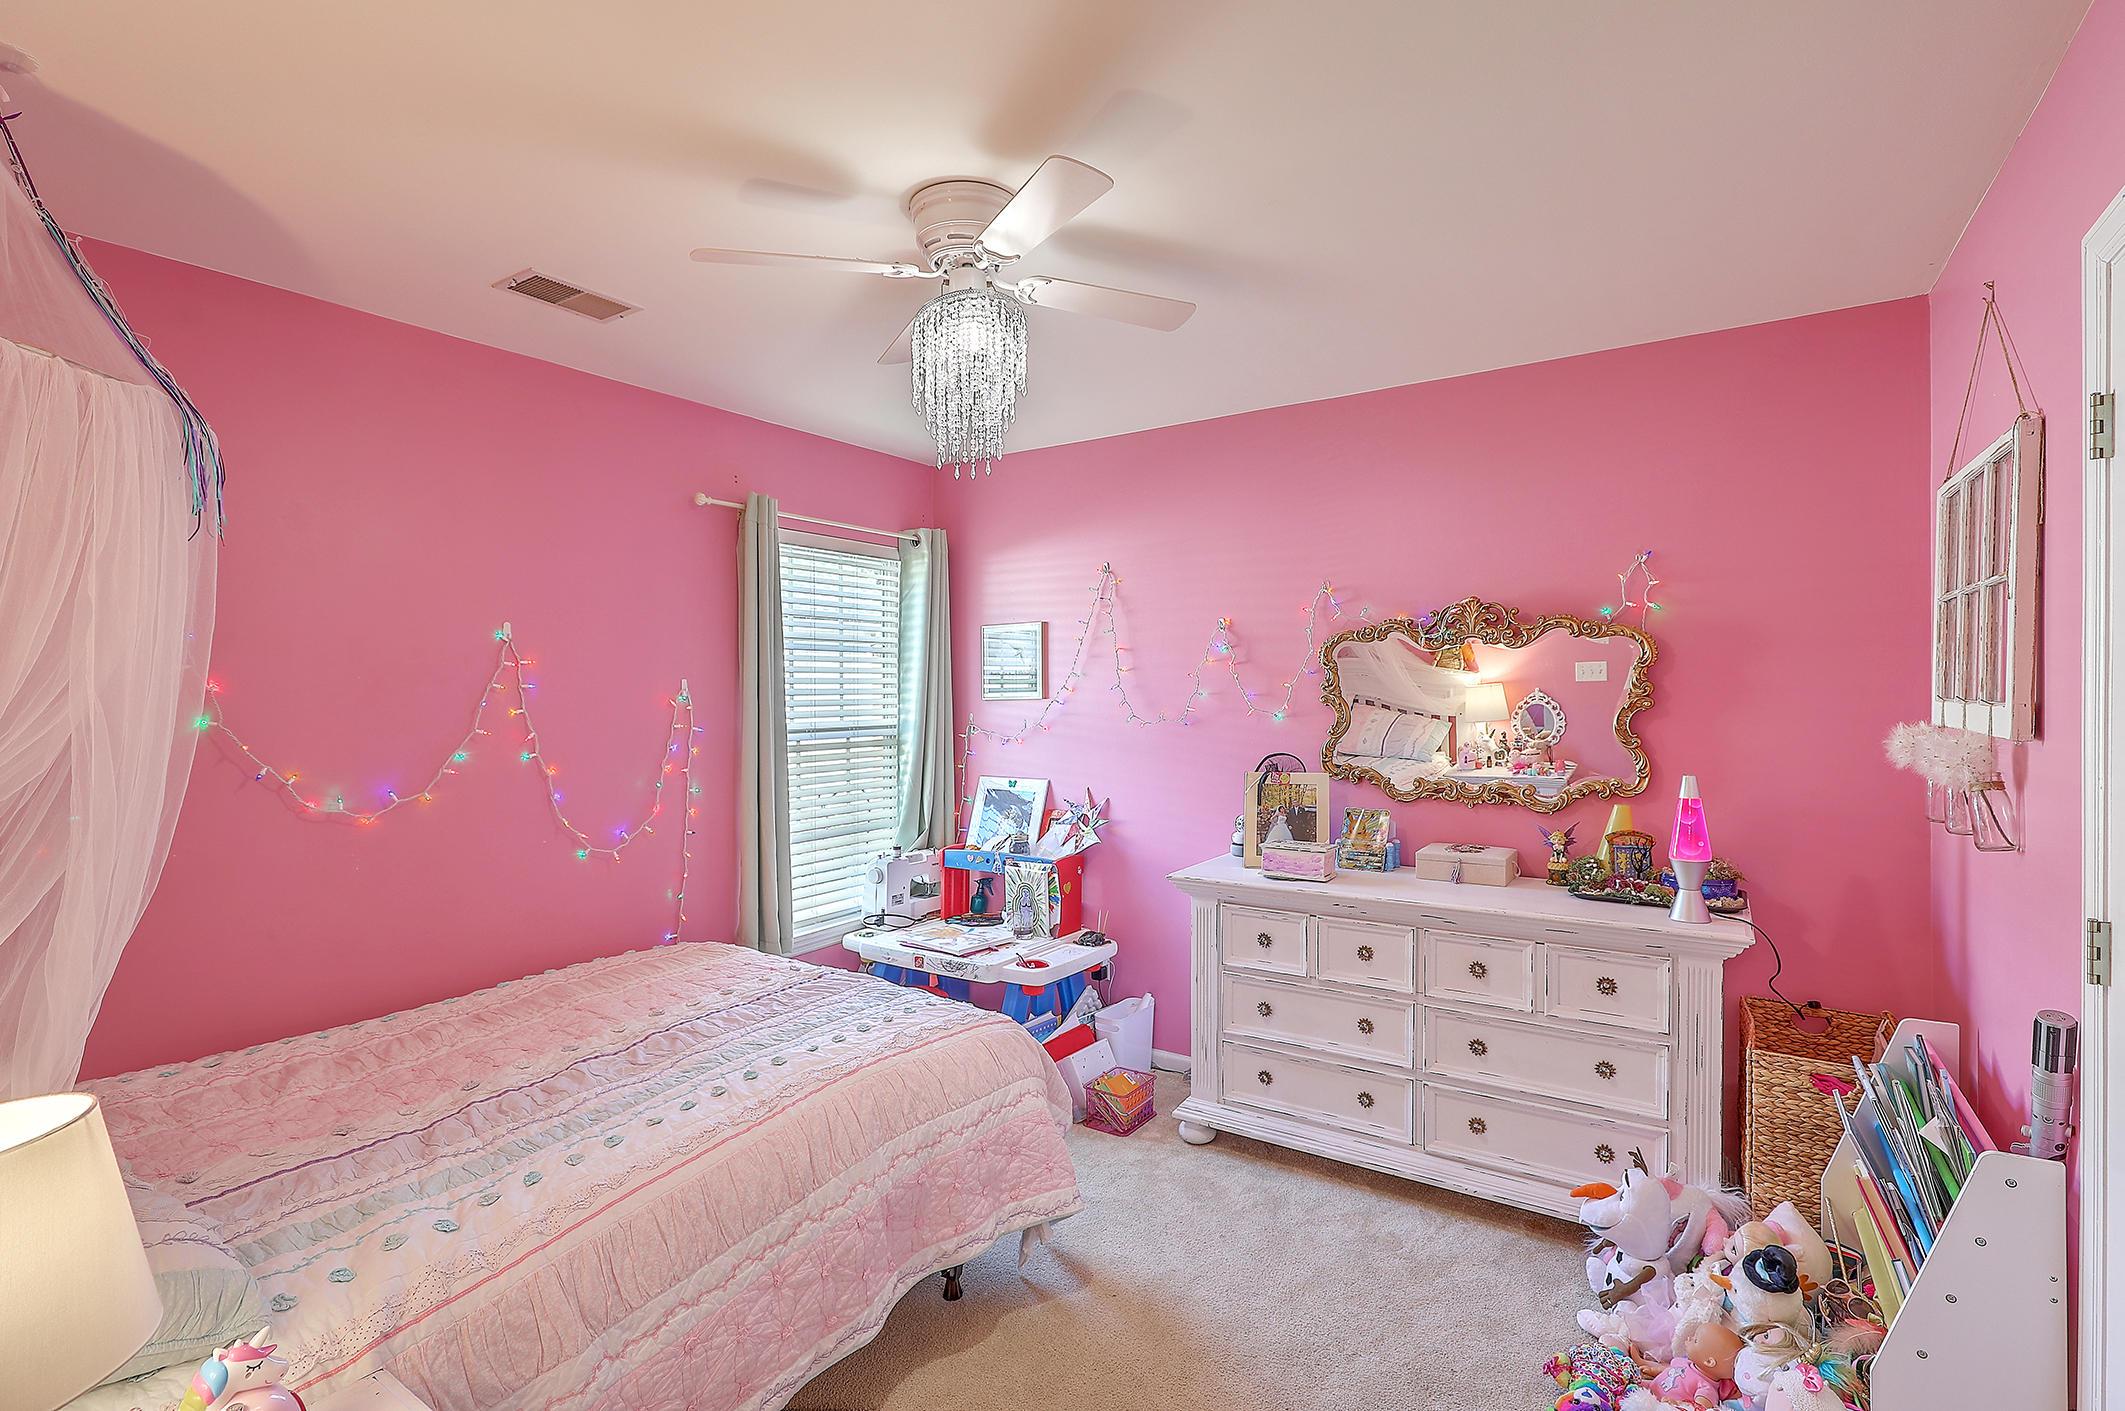 Dunes West Homes For Sale - 1471 Cypress Pointe, Mount Pleasant, SC - 36